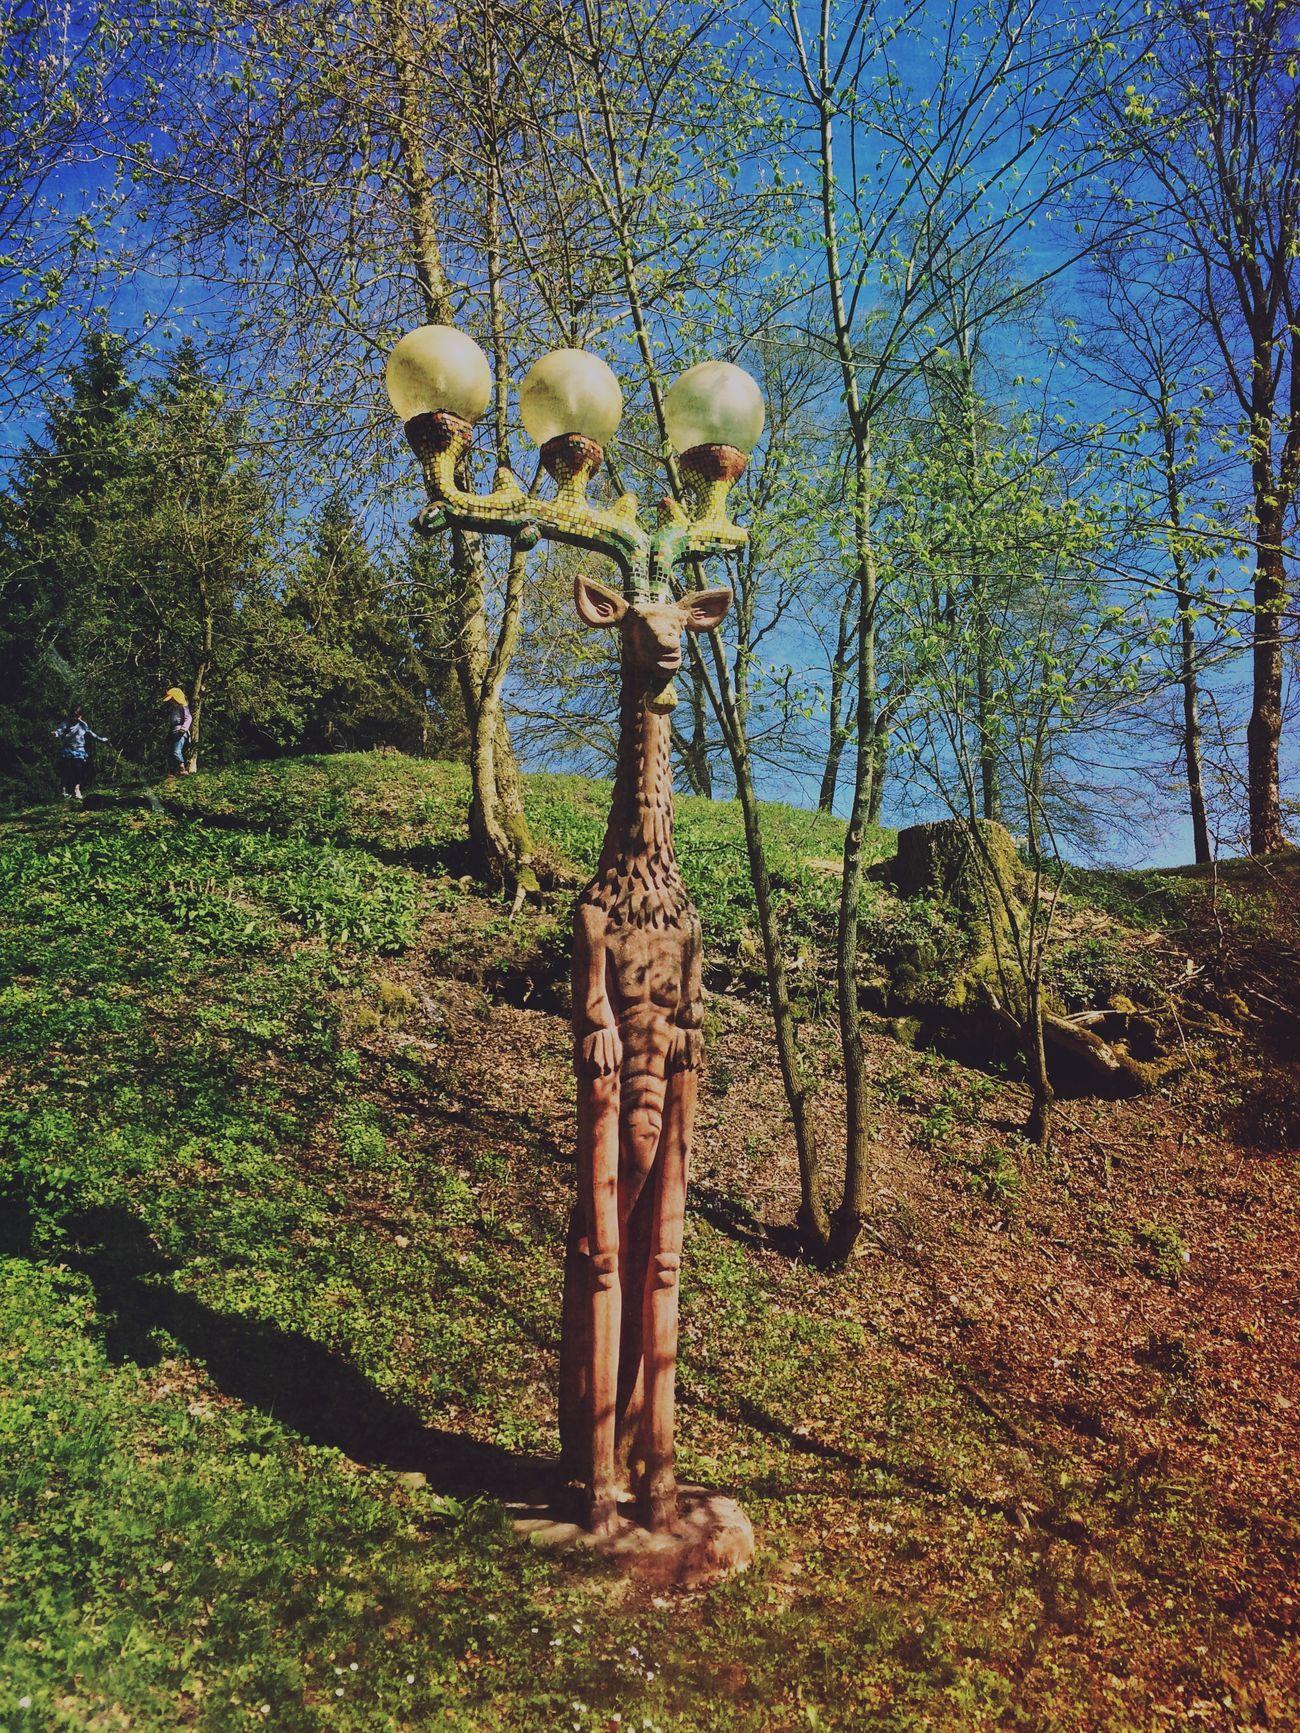 Three bulbs Mexturesapp EyeEm Nature Lover Nature_collection EyeEmSwiss ArtWork Lamp Streamzoofamily